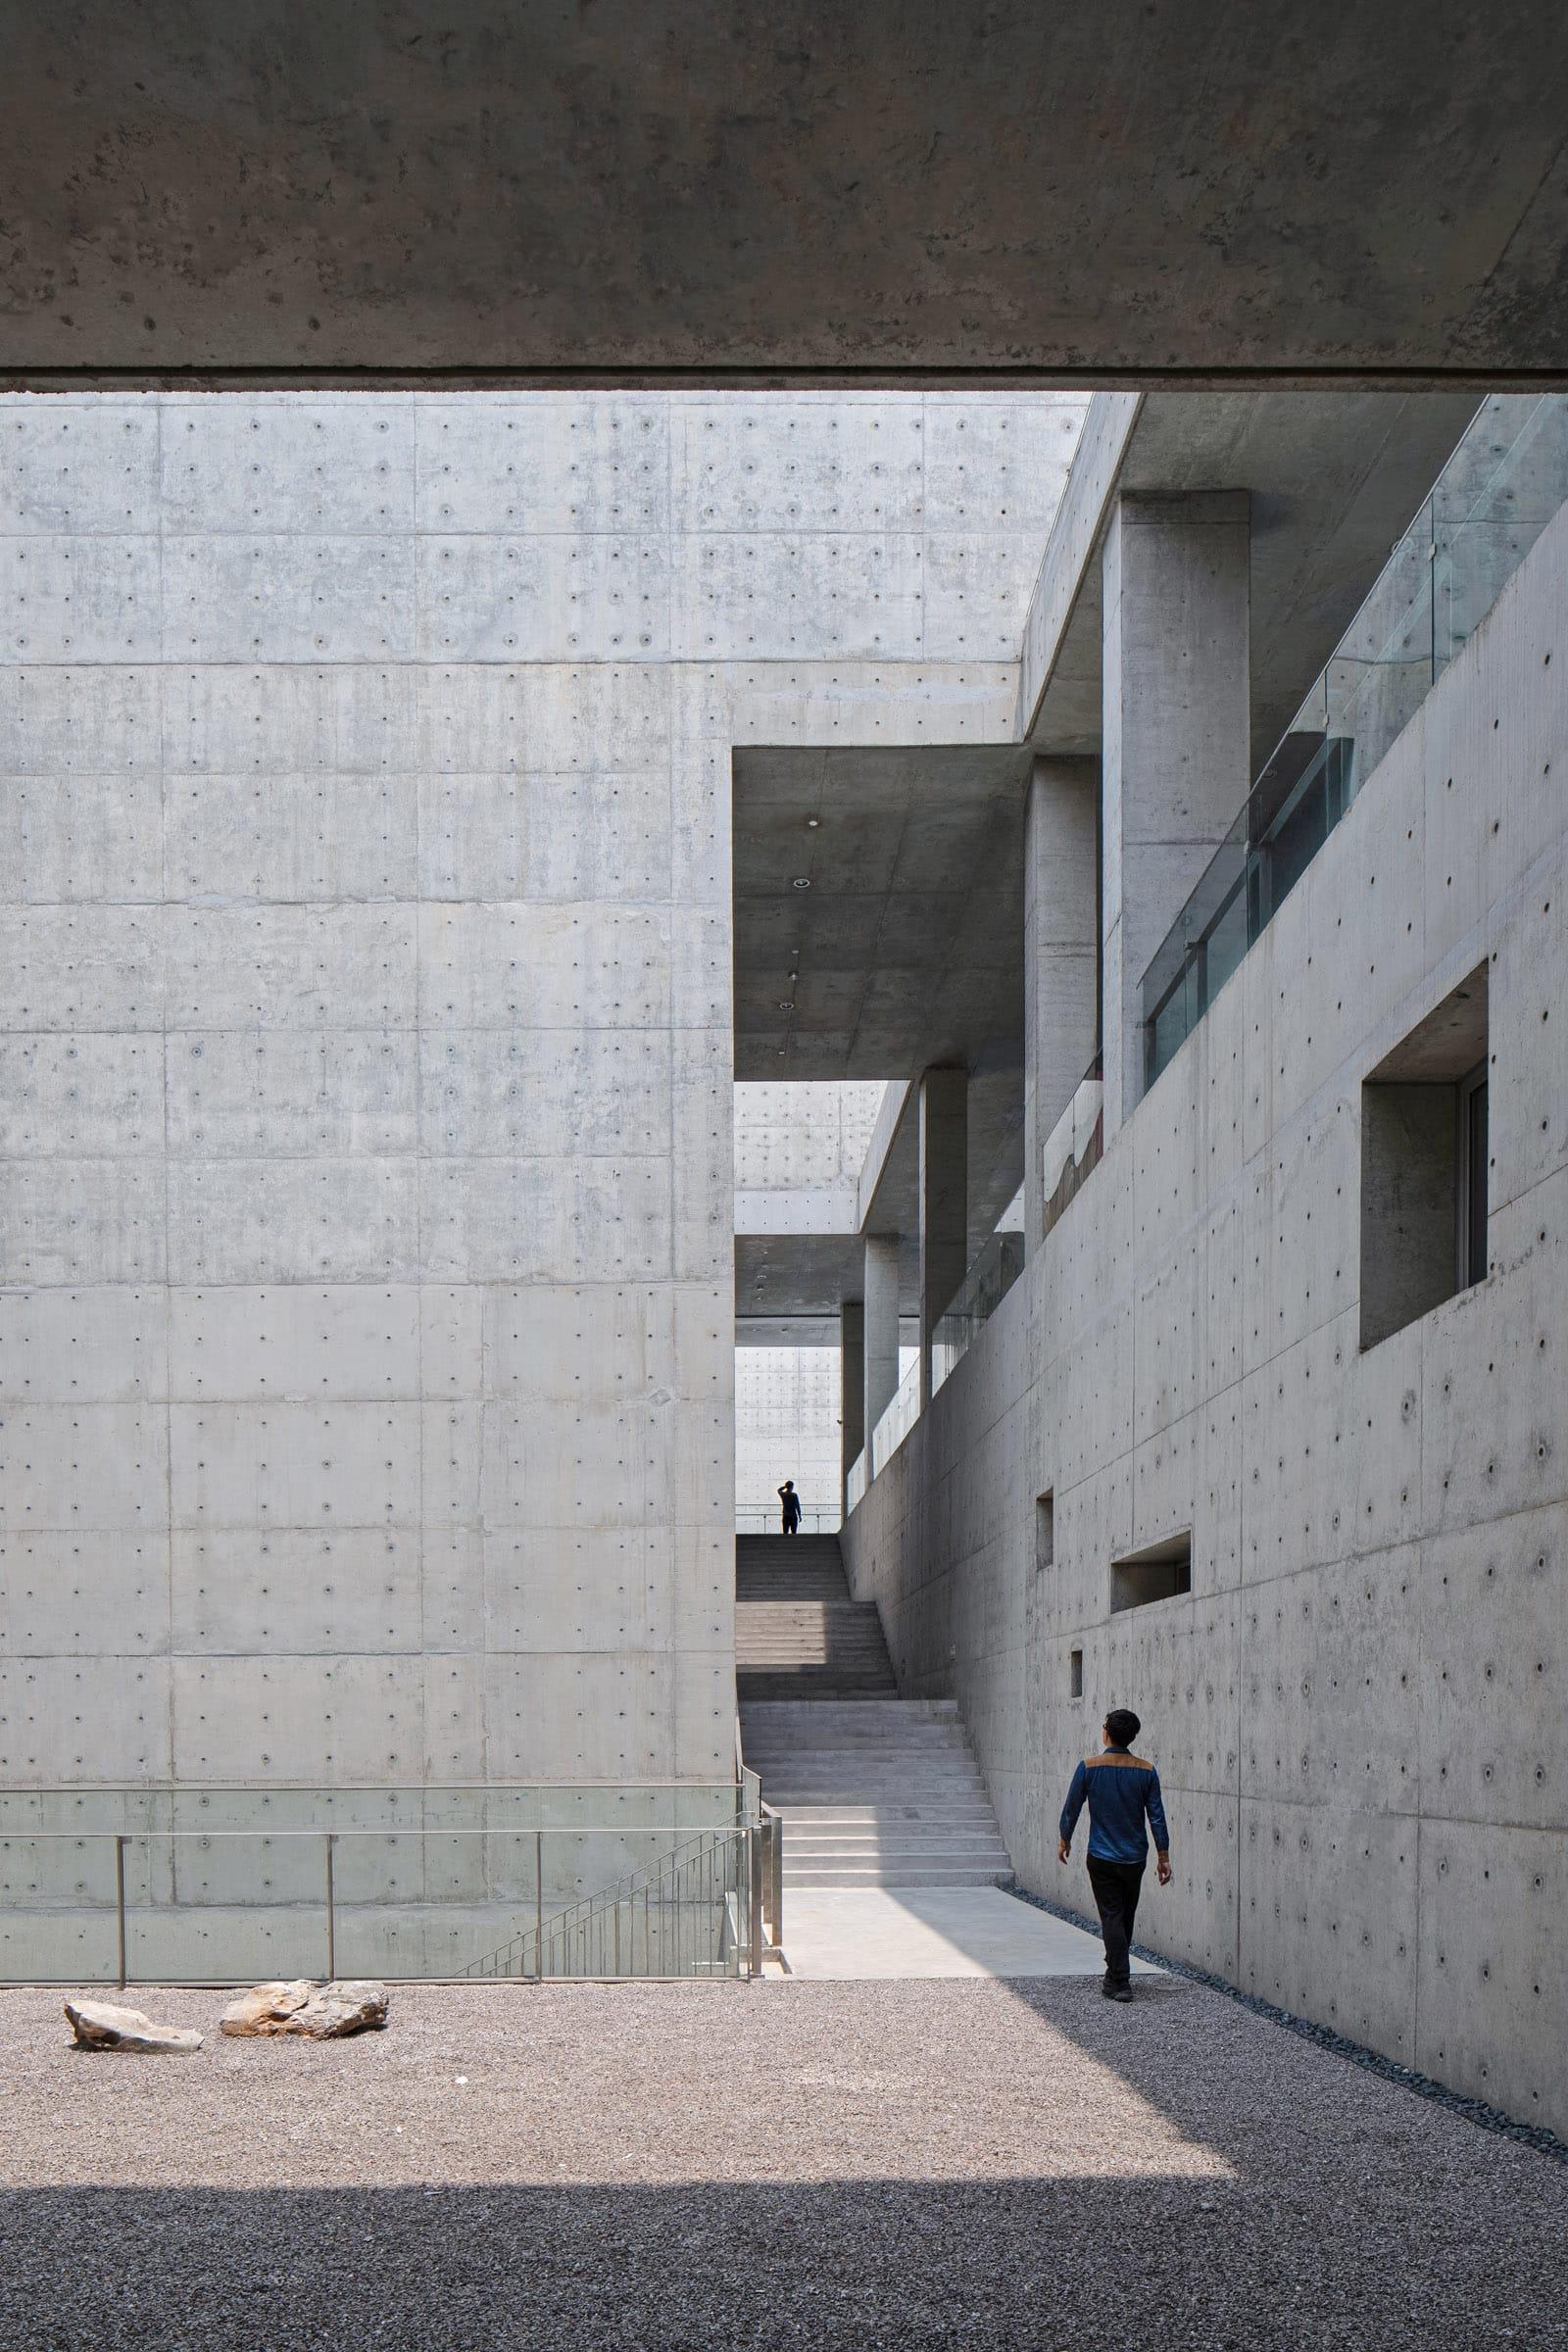 Shou County Culture and Art Center  - 20210702 Zhu Pei ShouCountyCultureArtCenter 11.2 57